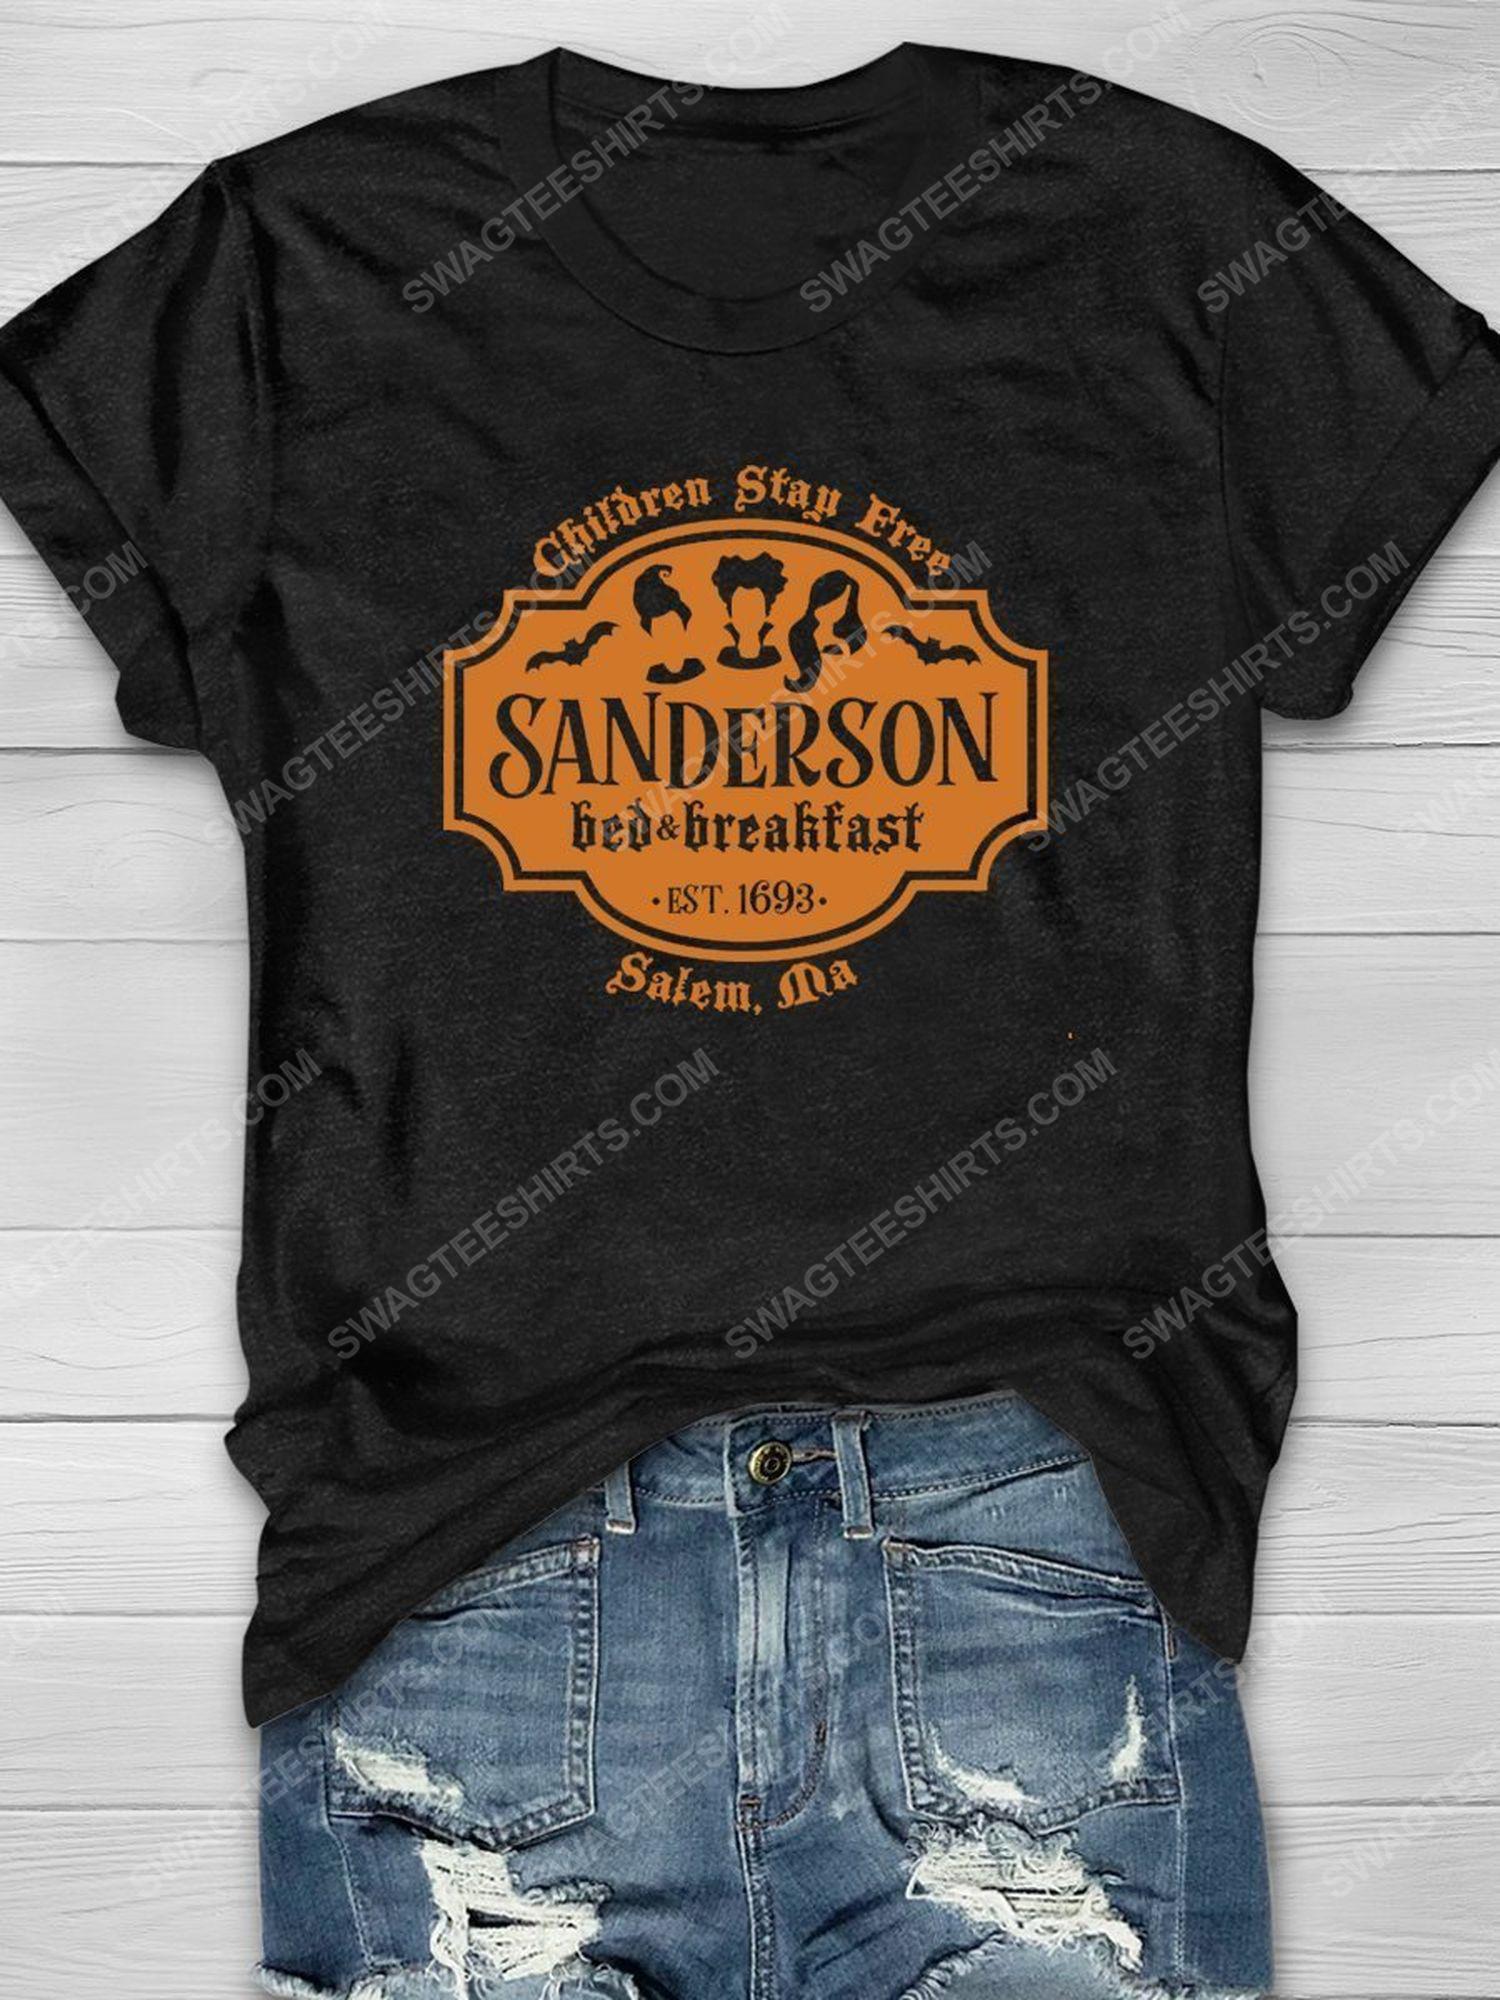 Halloween children stay free sanderson bed breakfast shirt 1 - Copy (2)